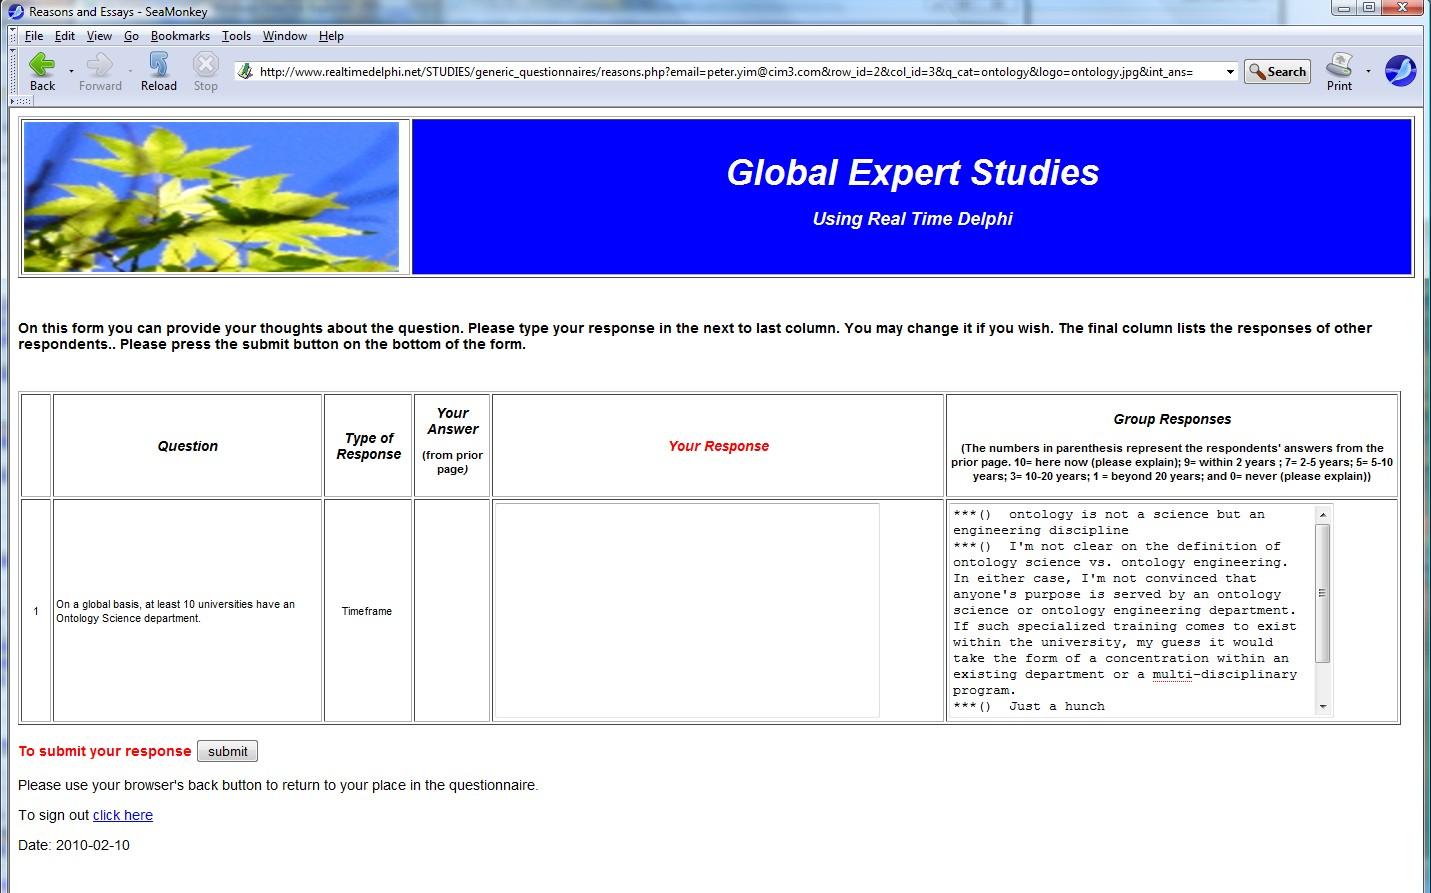 http://ontolog.cim3.net/file/work/OntologySummit2010/studies/RTDelphi-3/screenshot/OntologySummit2010_Survey-3_2-1a.jpg